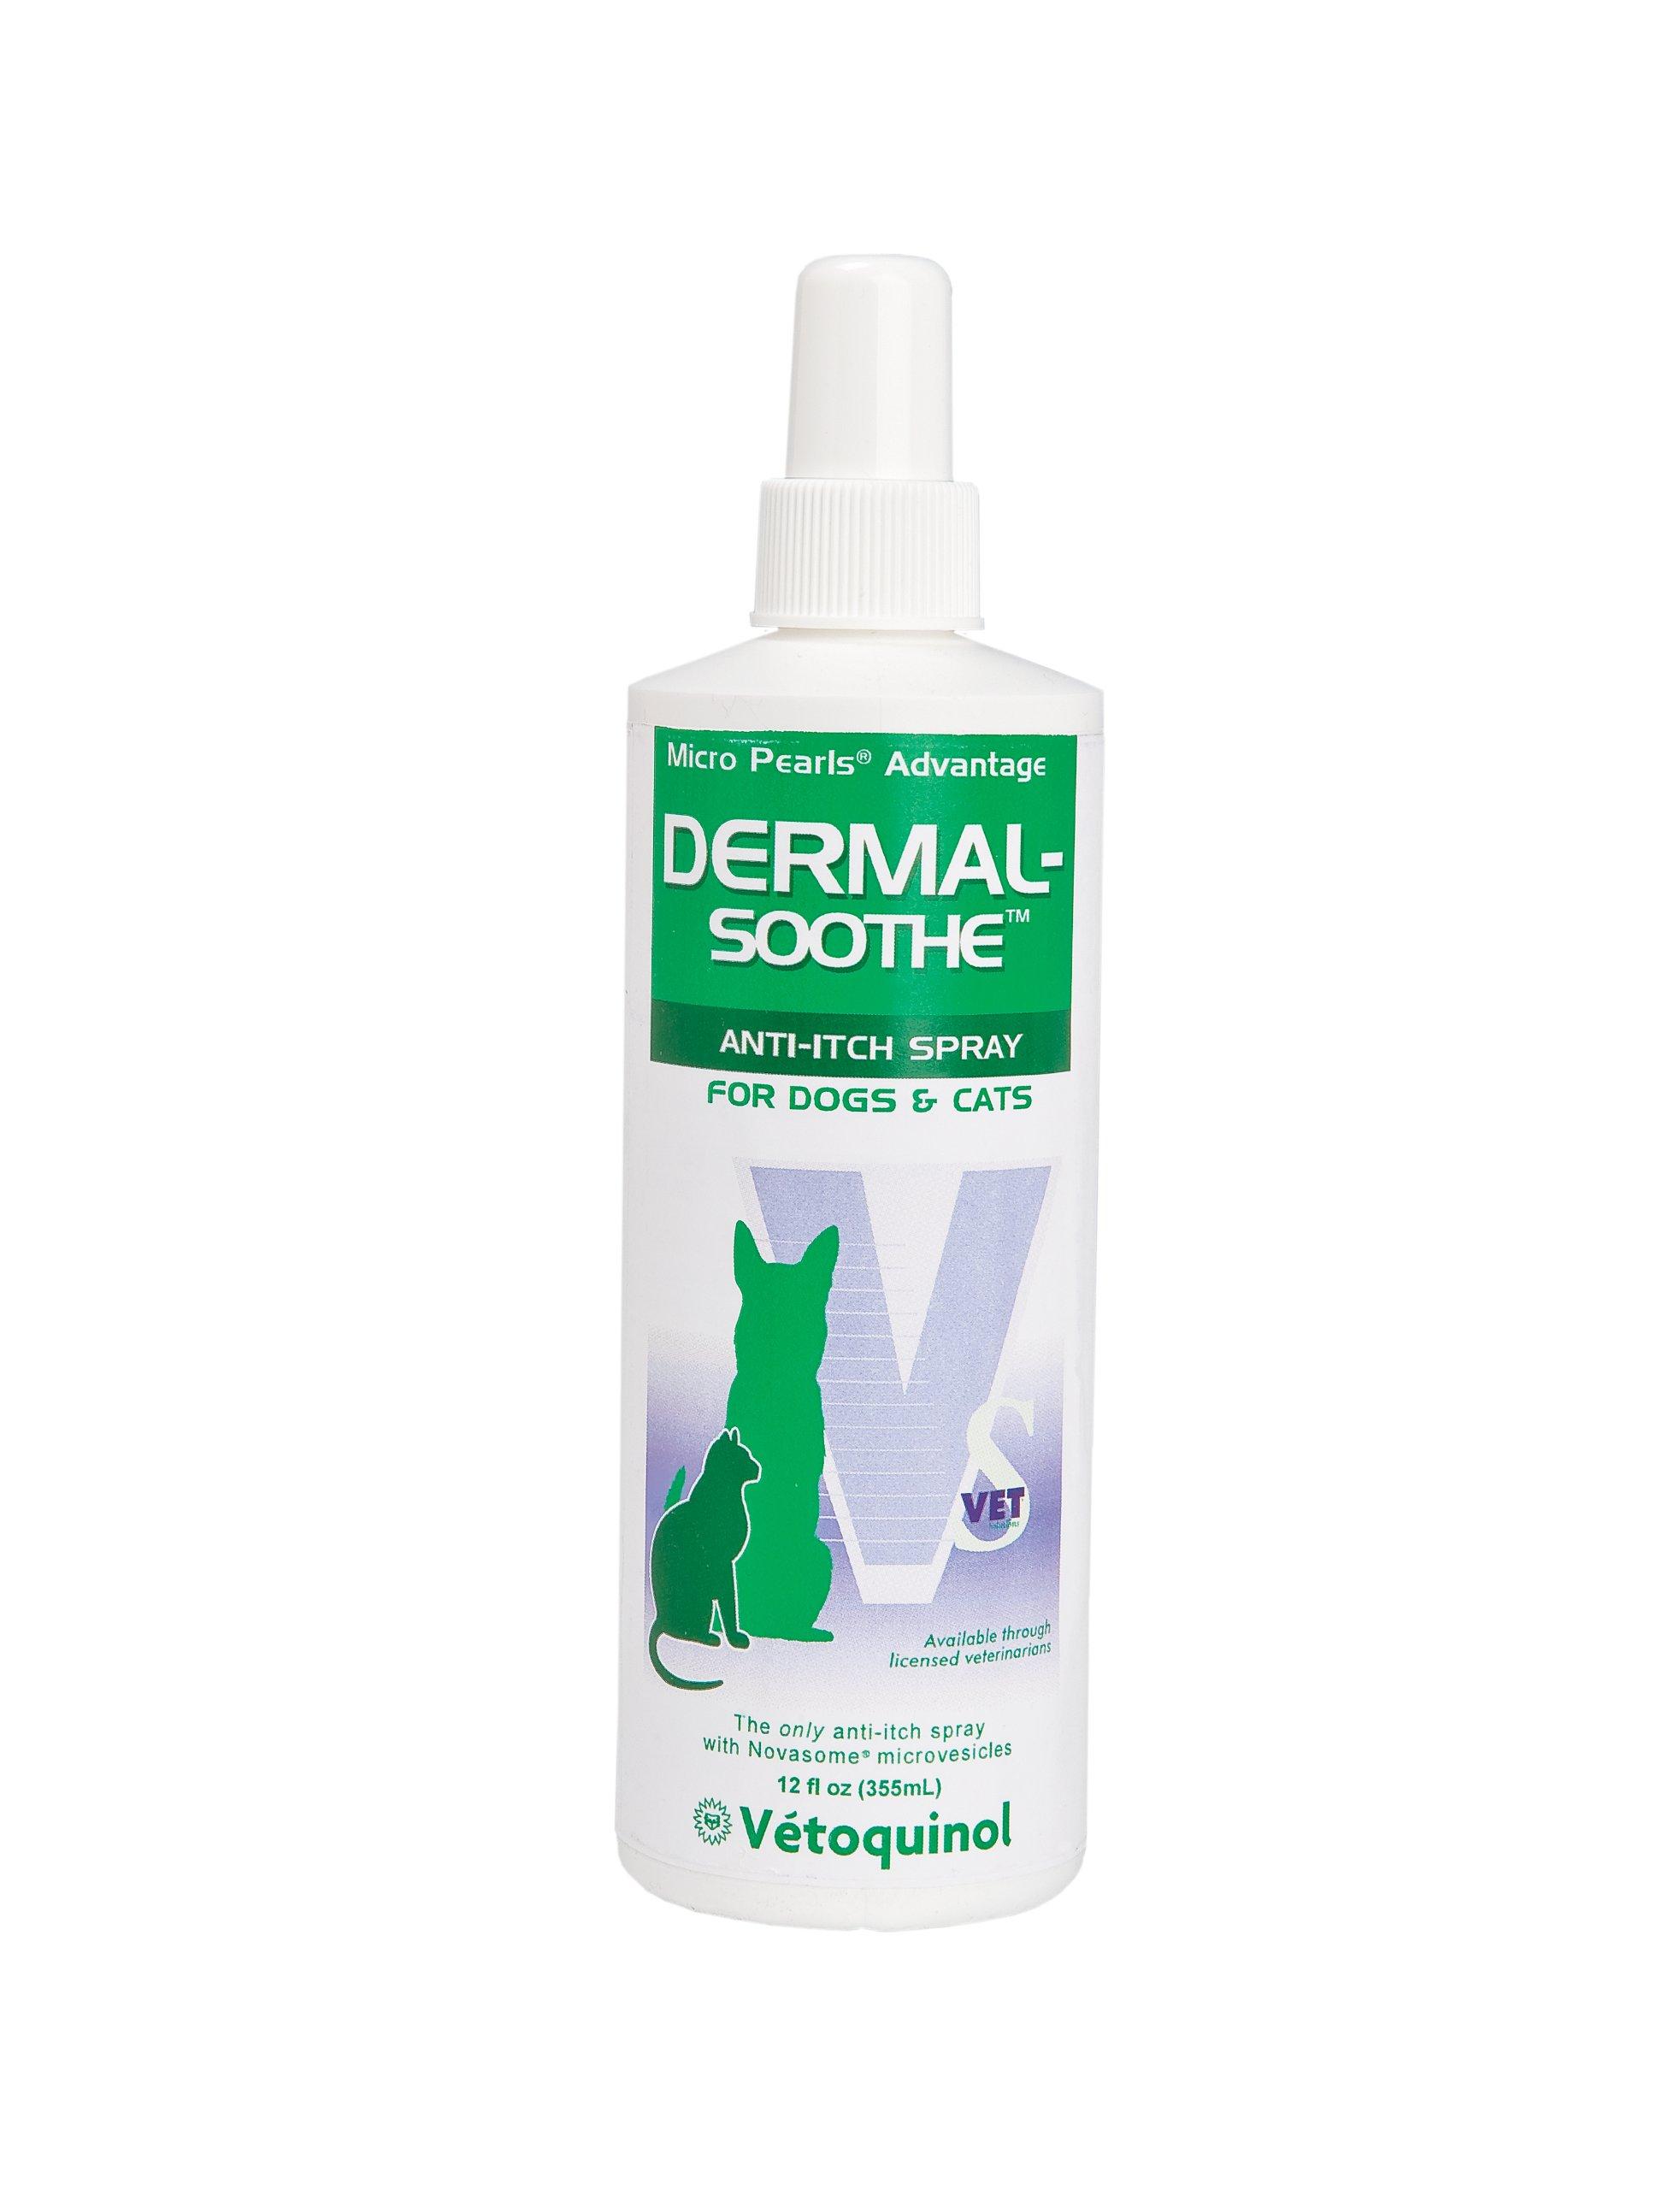 Vetoquinol 411528 MPA Dermal-Soothe Spray,12 oz